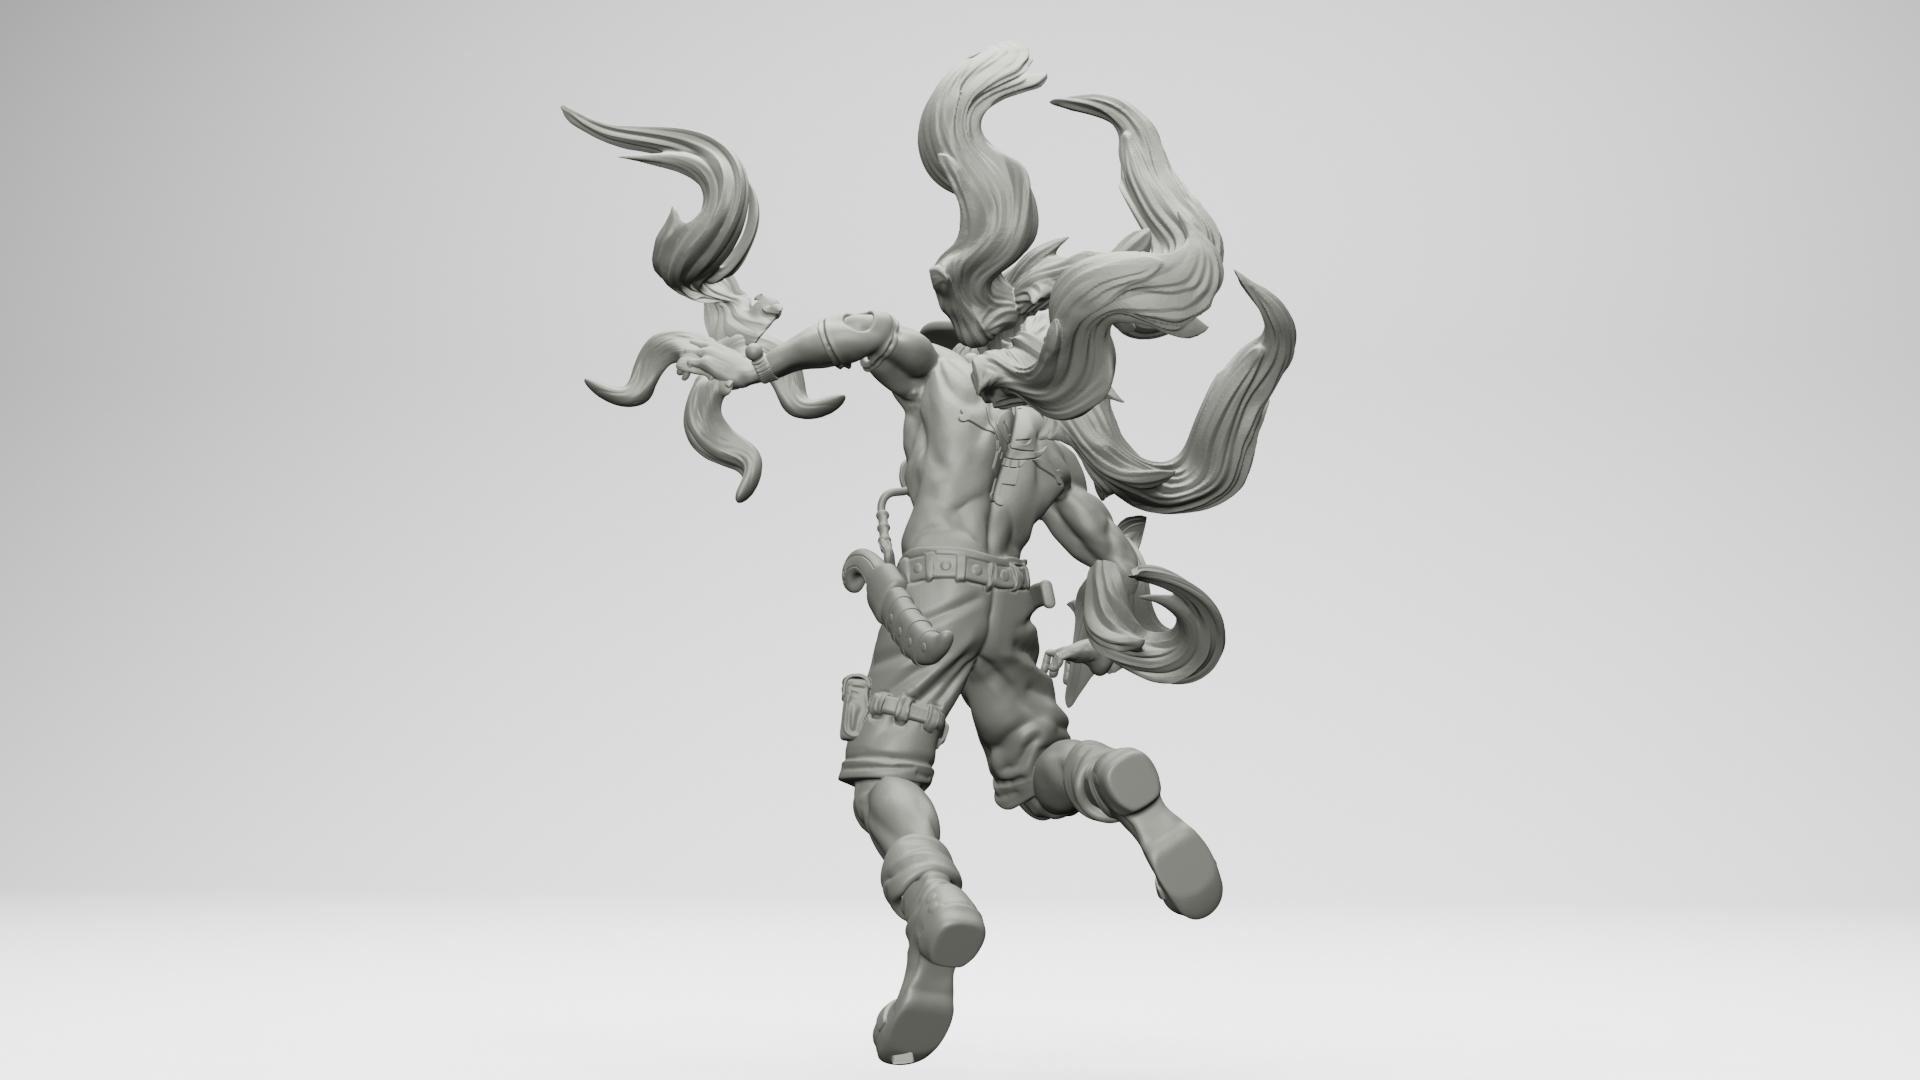 15.jpg Download STL file Portgas D. Ace - One Piece 3D printable • 3D print model, ronnie_yonk